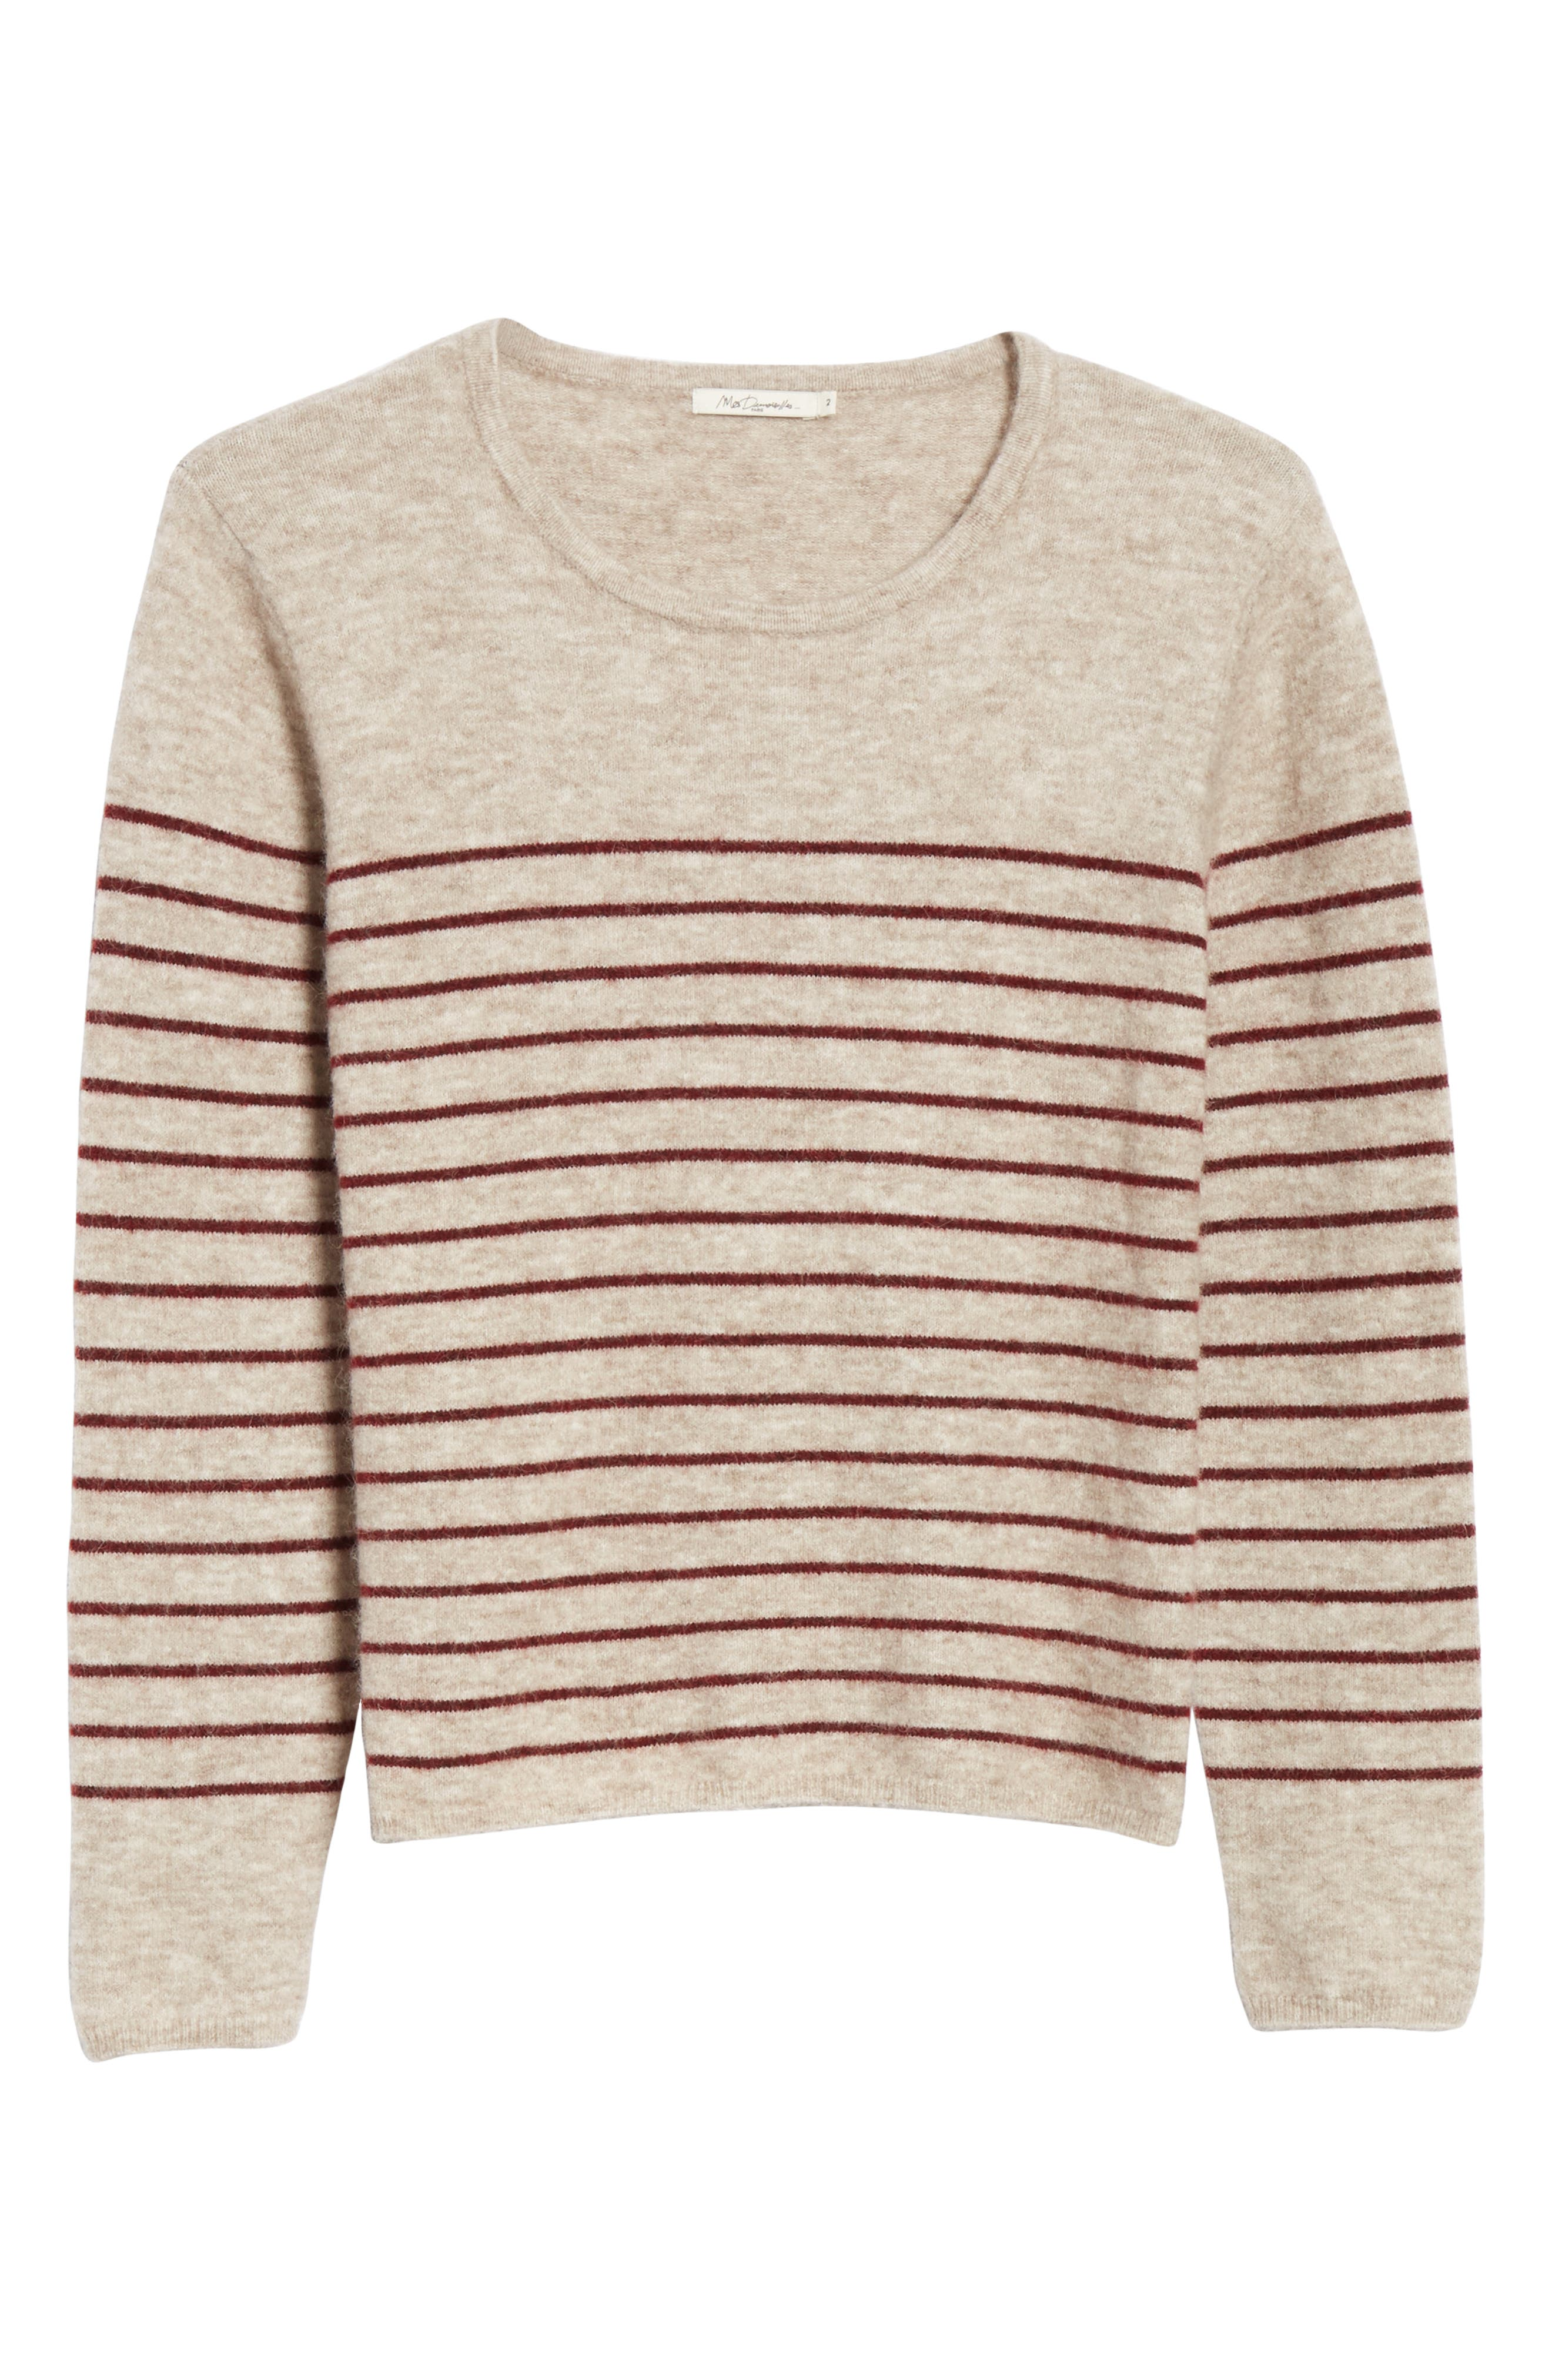 Artaud Stripe Sweater,                             Alternate thumbnail 6, color,                             BEIGE